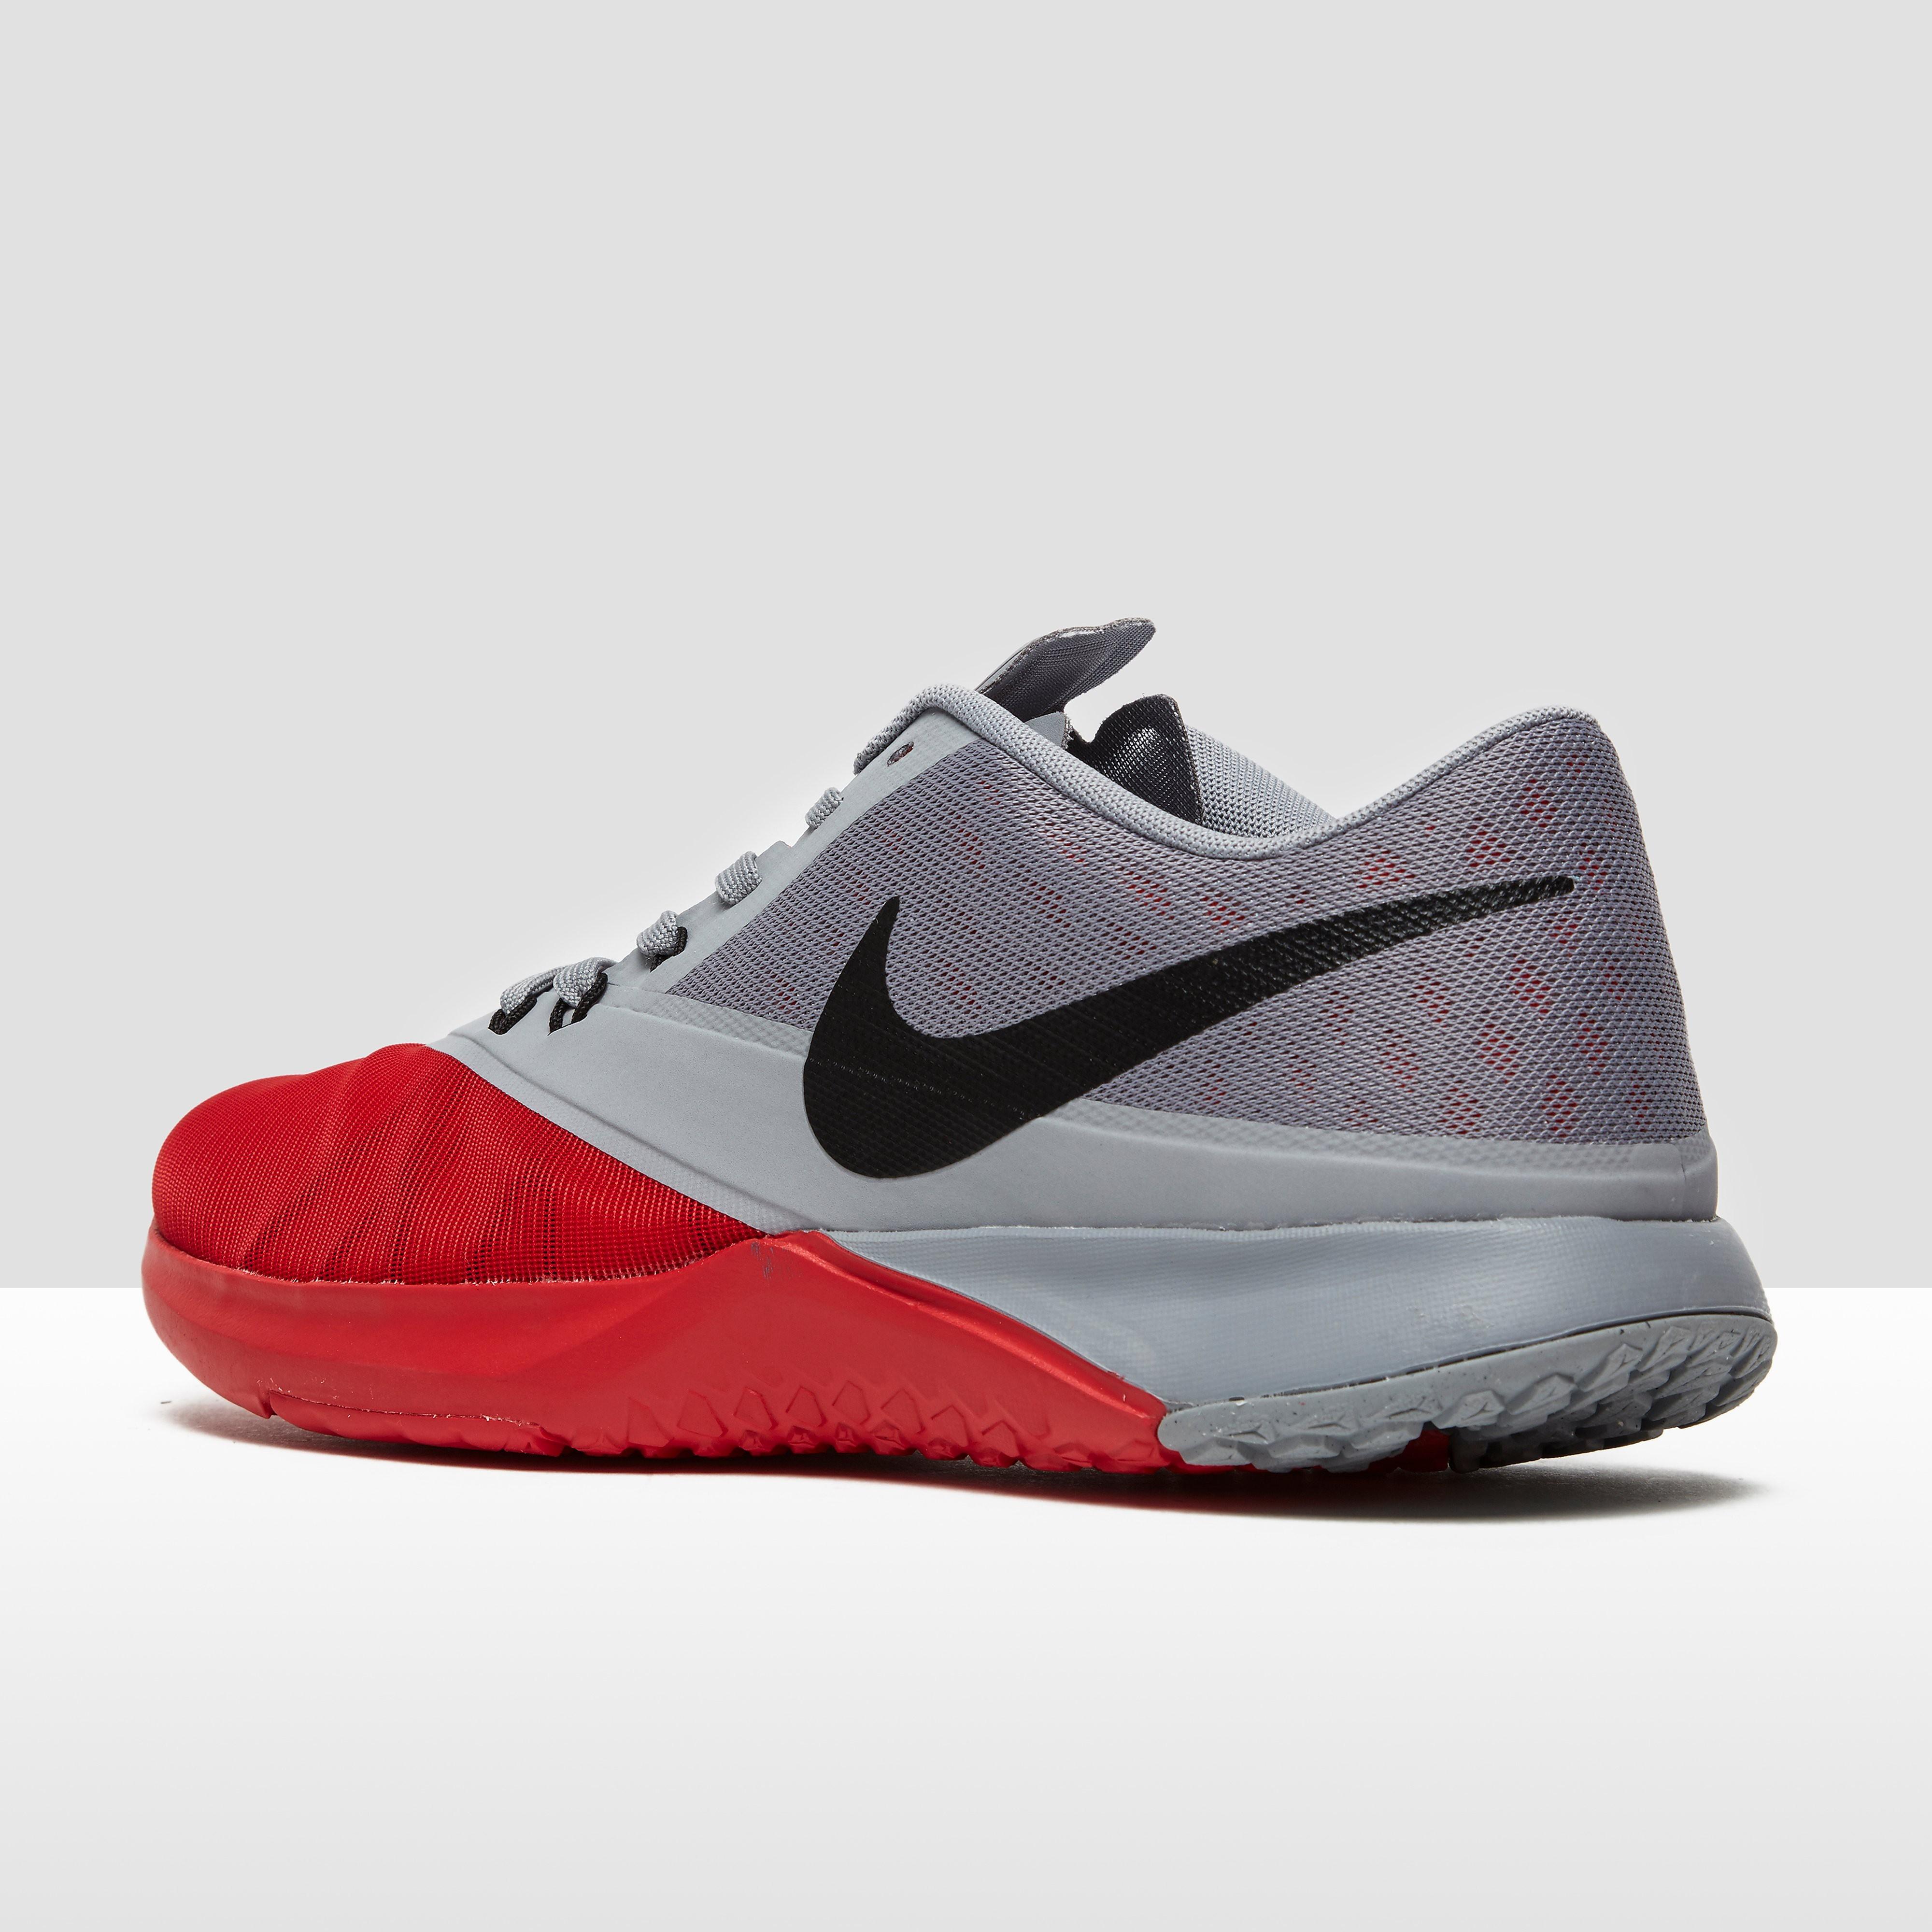 Nike FS Lite Trainer 3 Men's Training Shoes